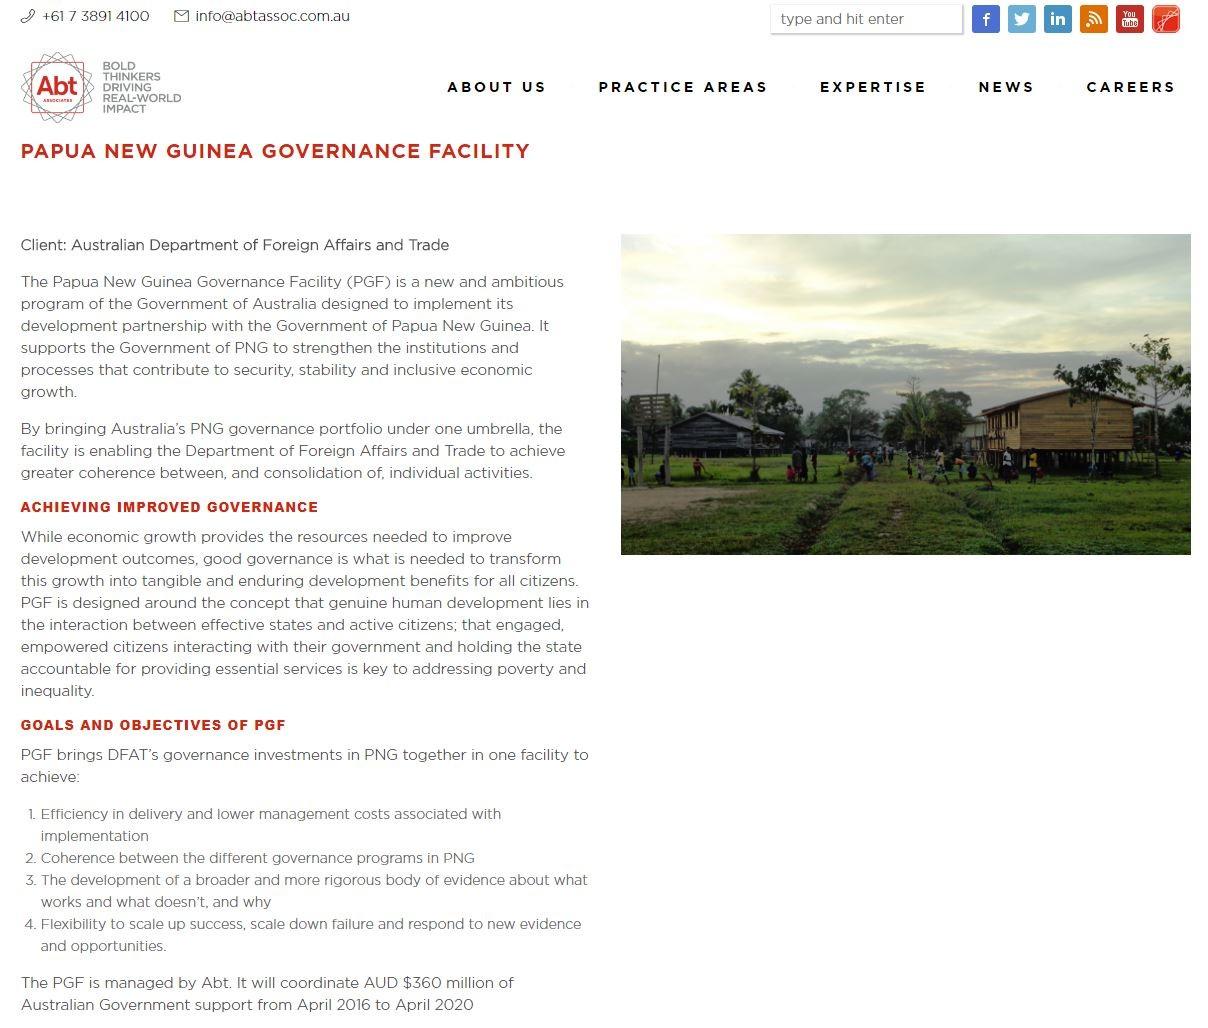 Recruitment Case Study: Executive Search for the Autonomous.